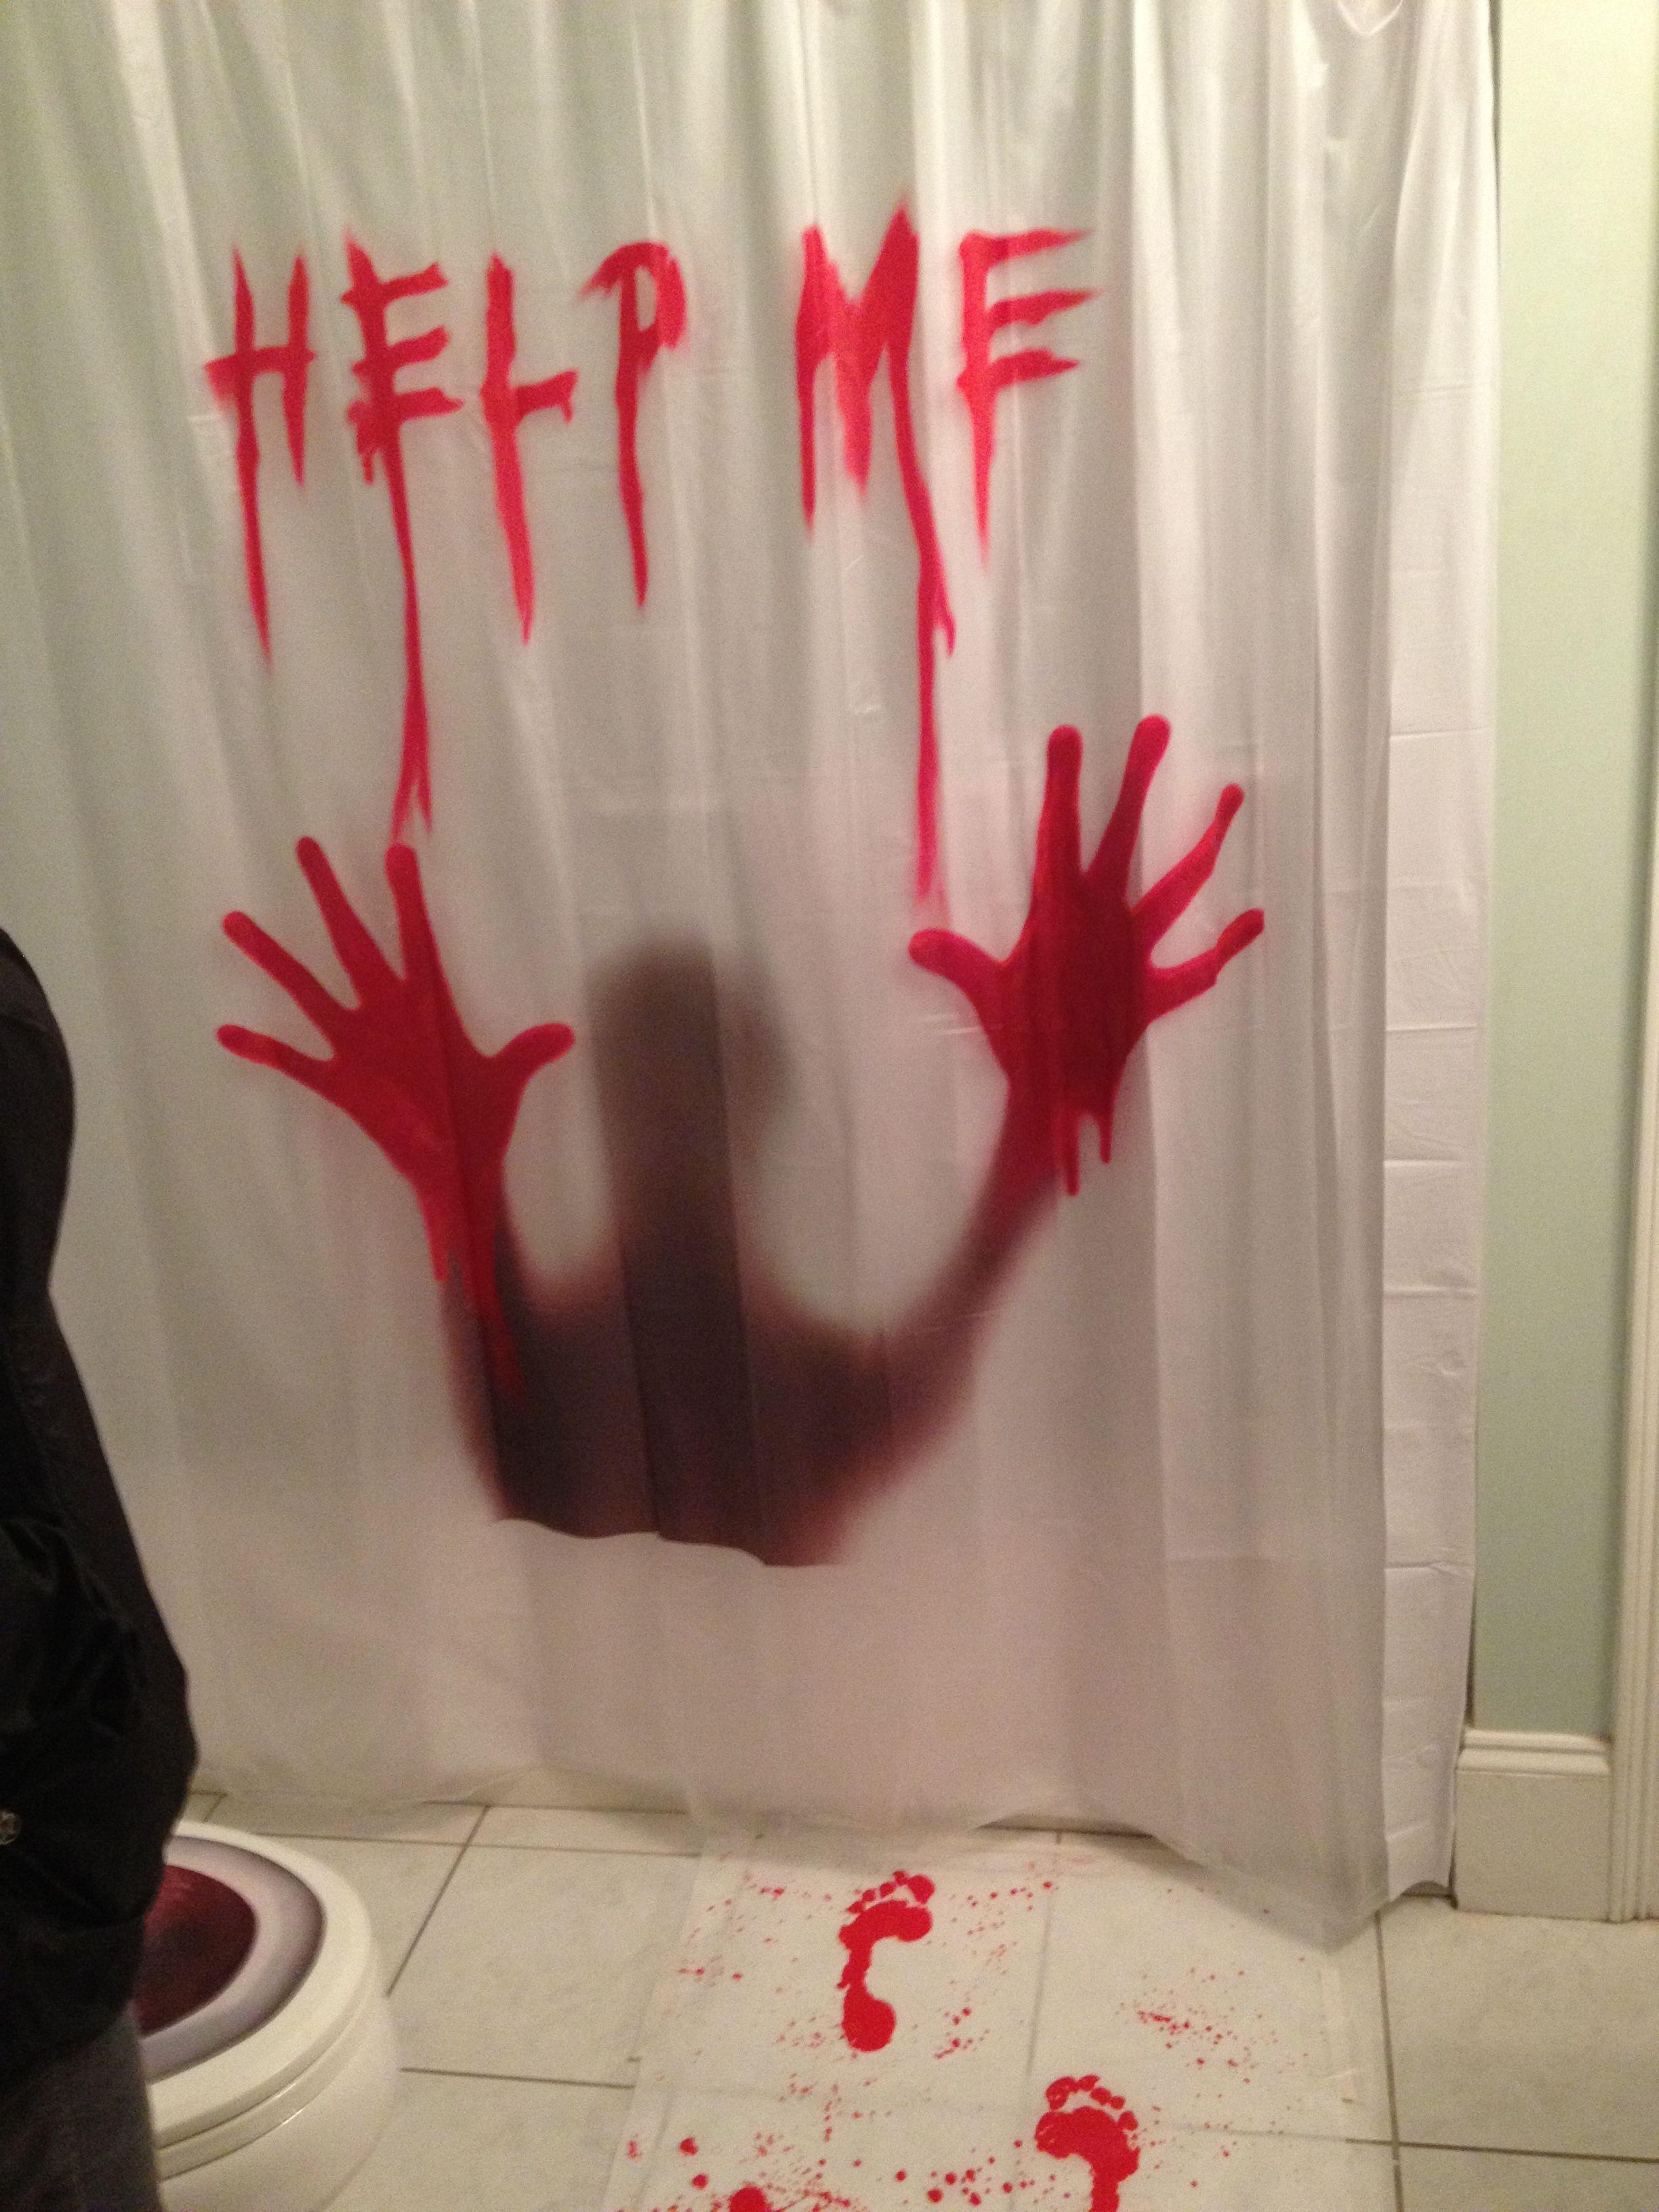 Halloween bathroom ideas - Find This Pin And More On Halloween Help Me Halloween Decorations Bathroom Ideas